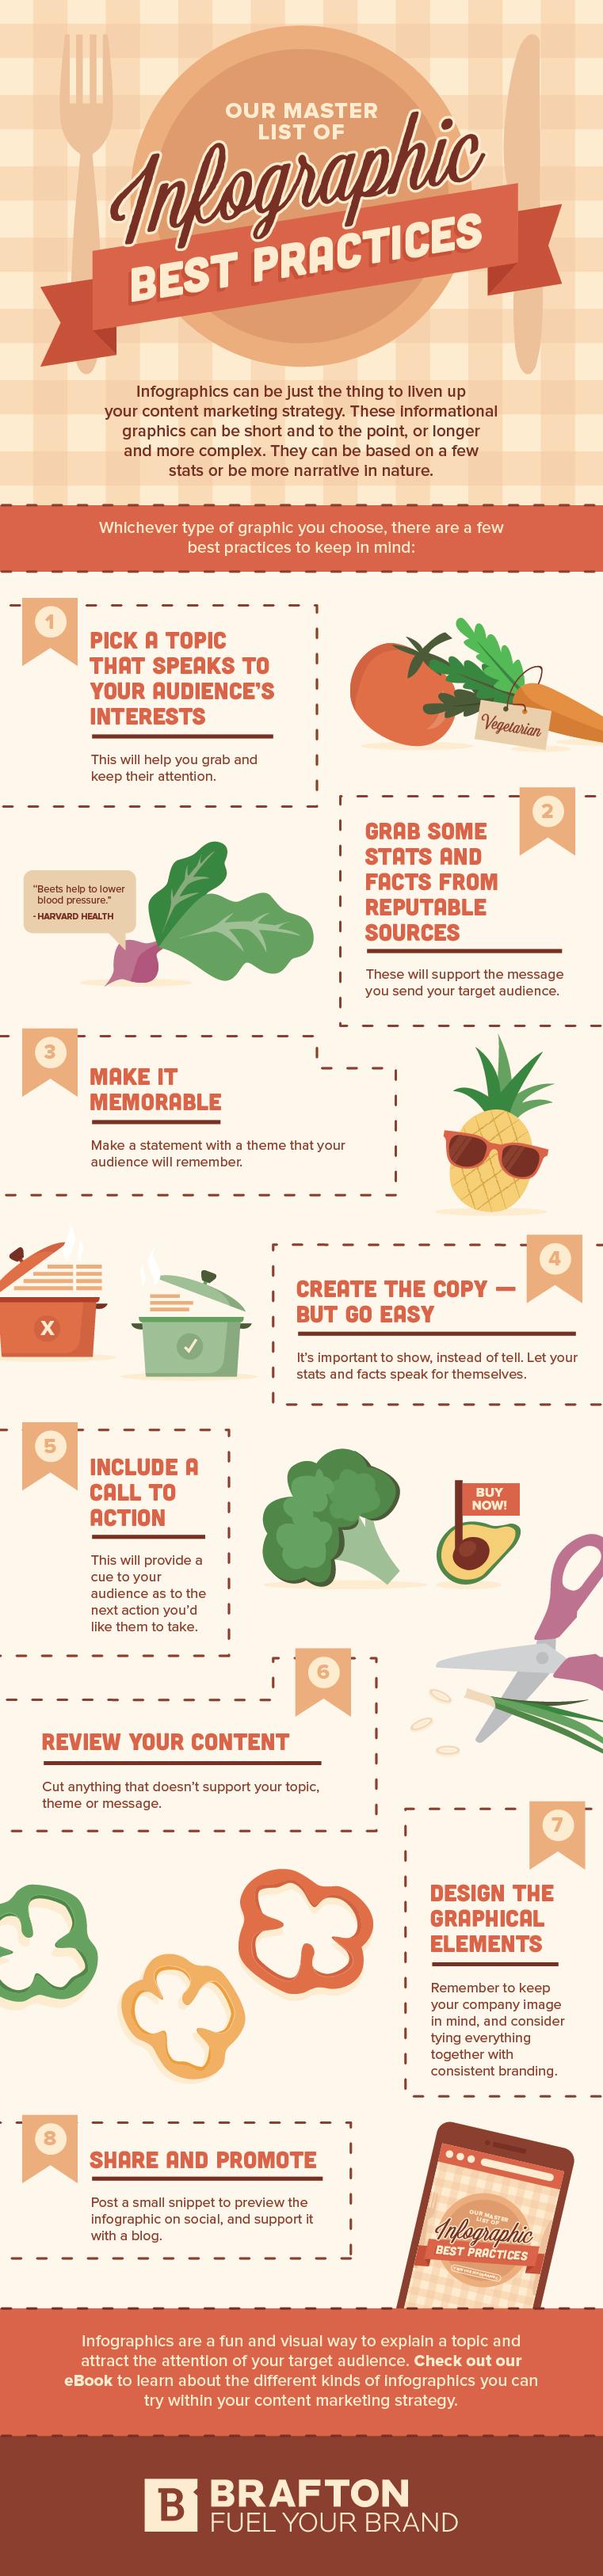 Brafton Infographics Best Practices GG.jpg